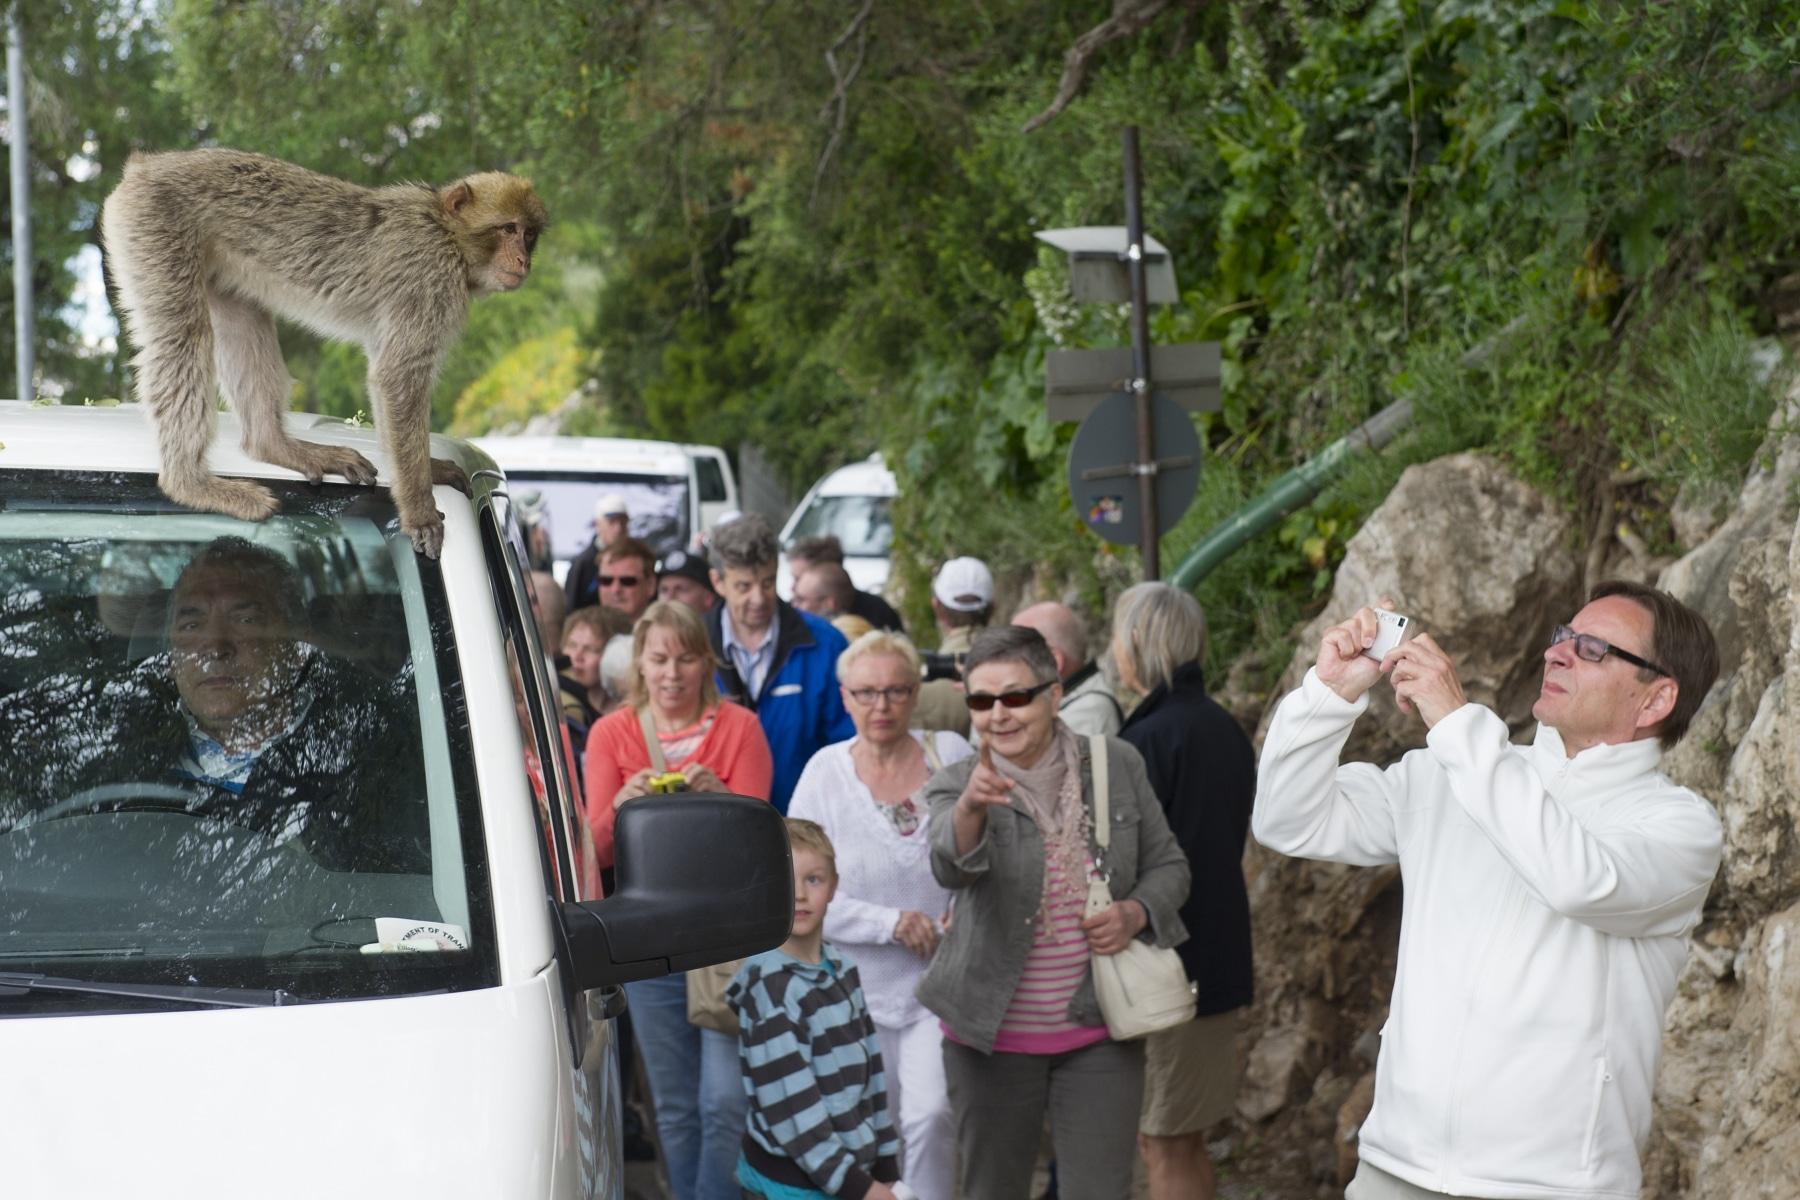 monos-zona-alta-del-pen-con-turistas-06_9222301105_o